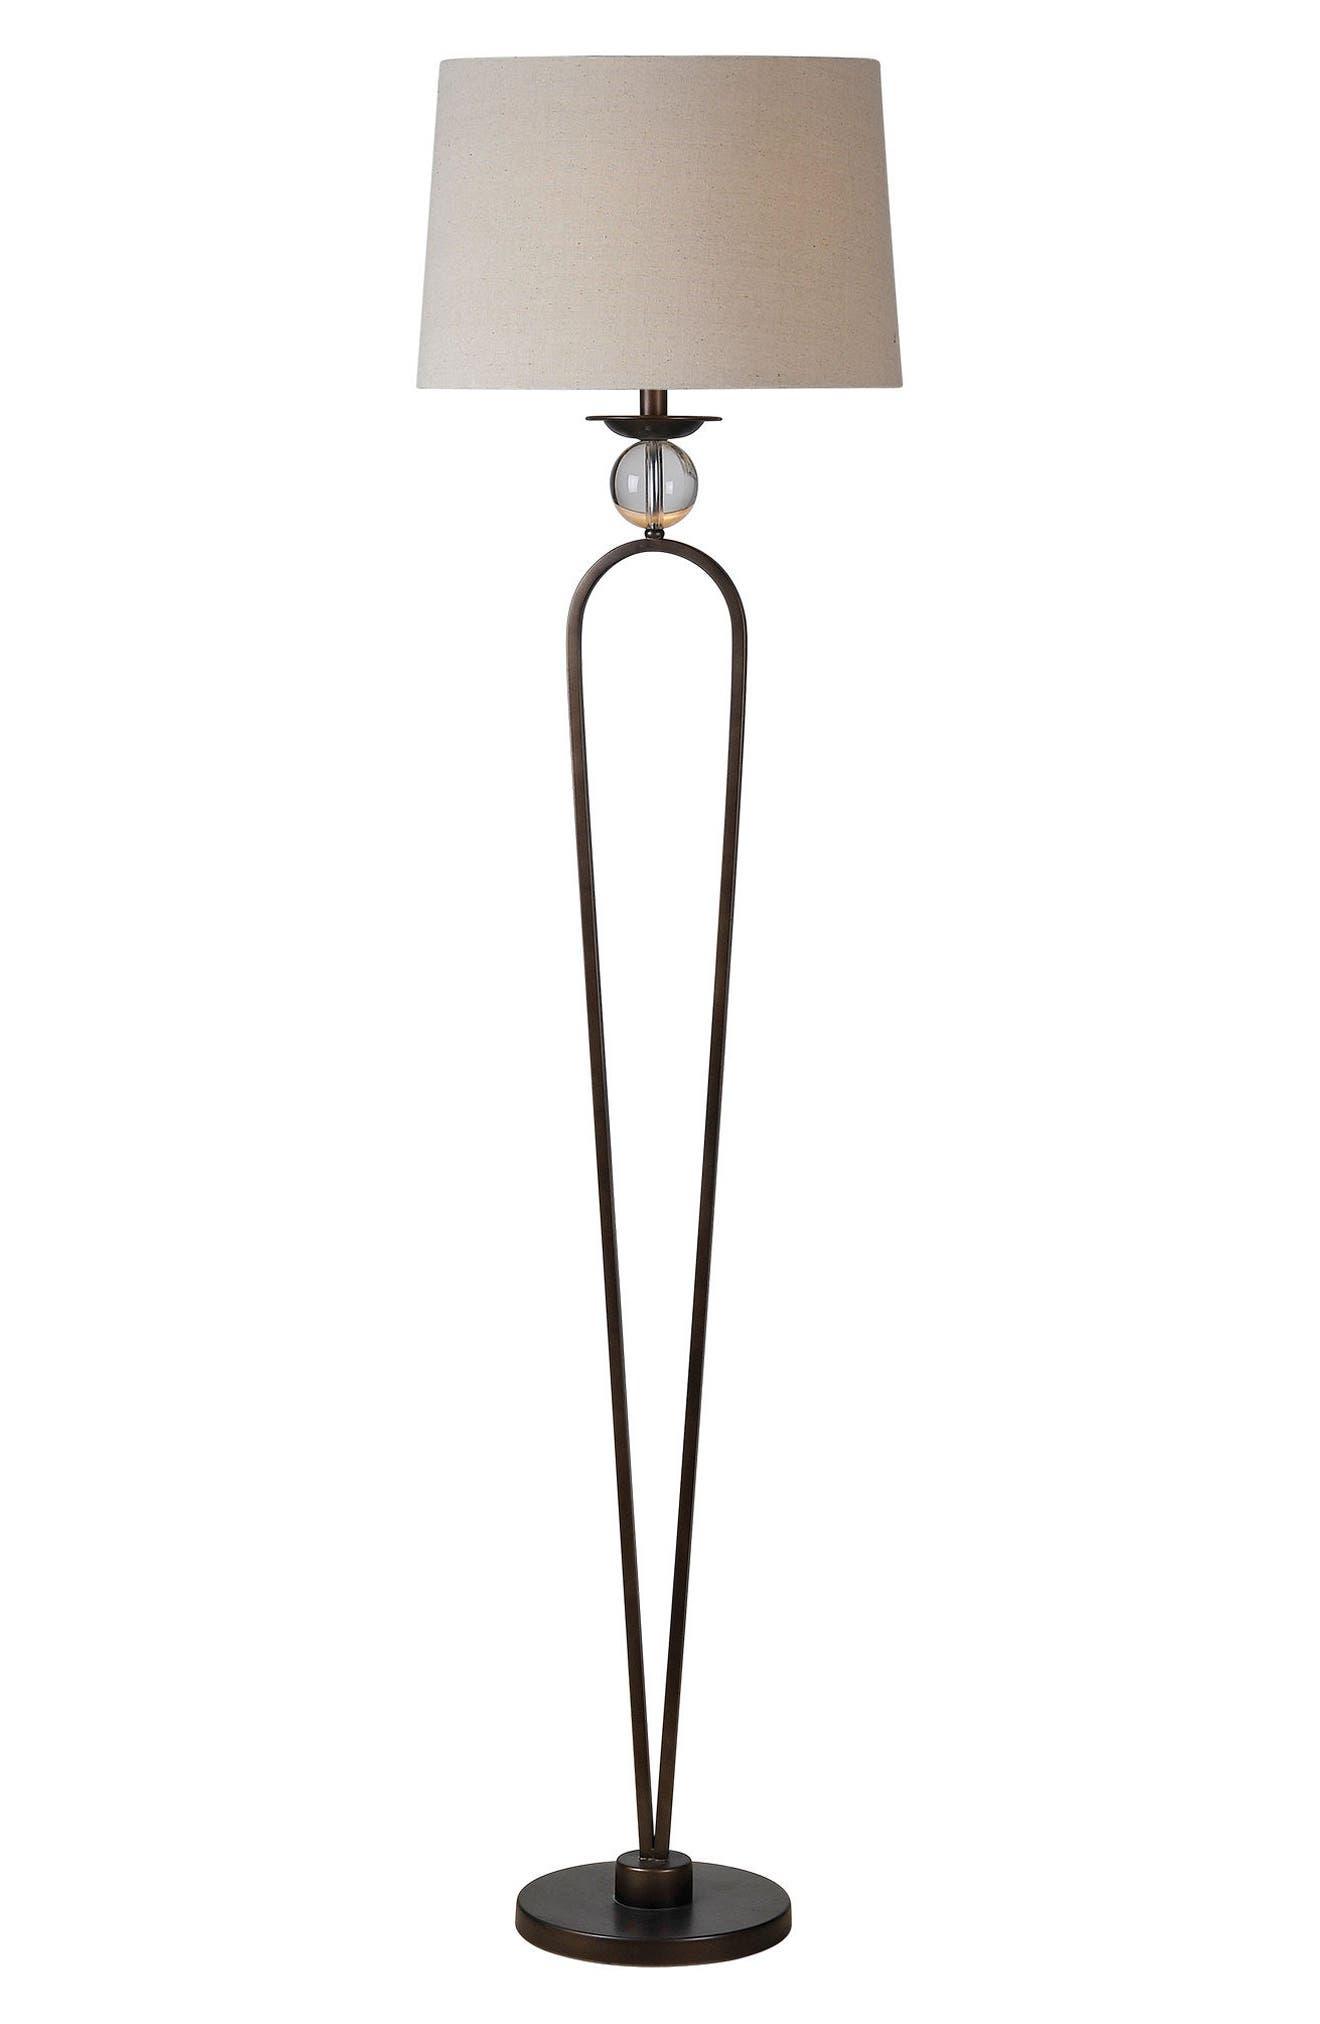 Pembroke Floor Lamp,                         Main,                         color, 220